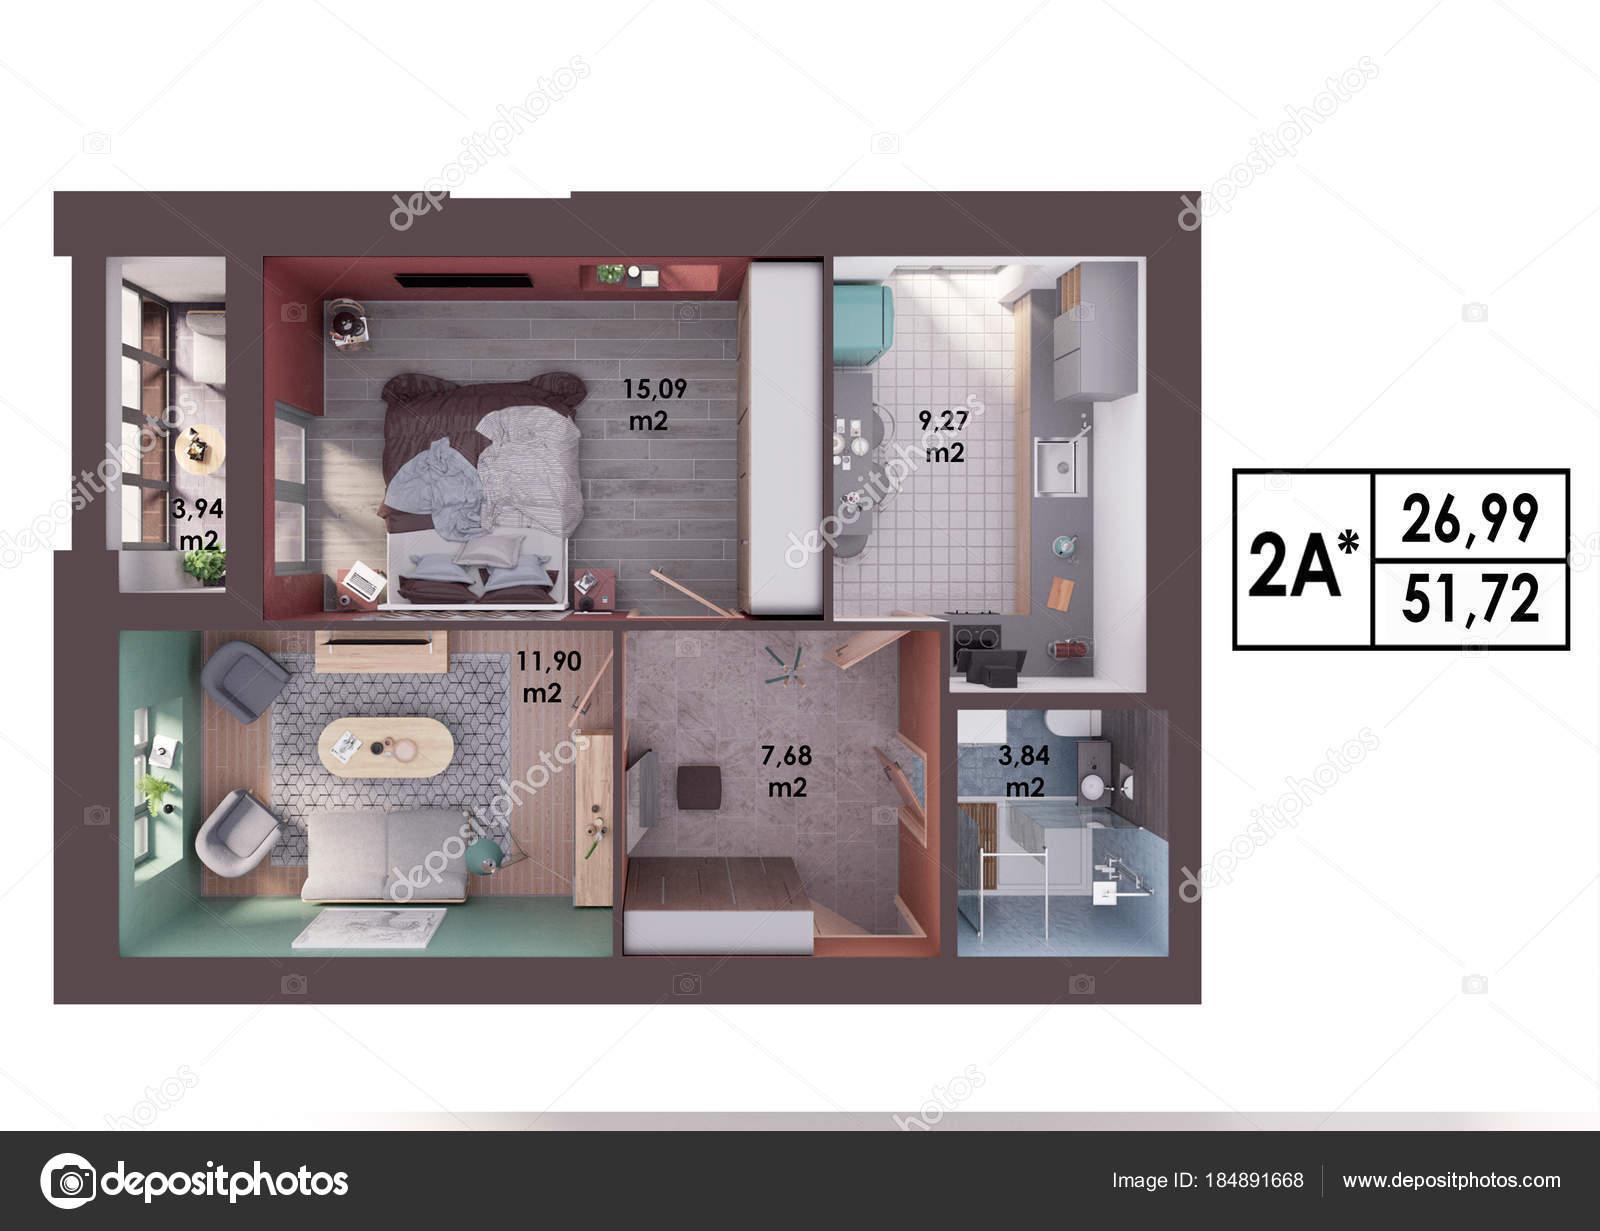 Programma rendering layout moderno appartamento due camere letto